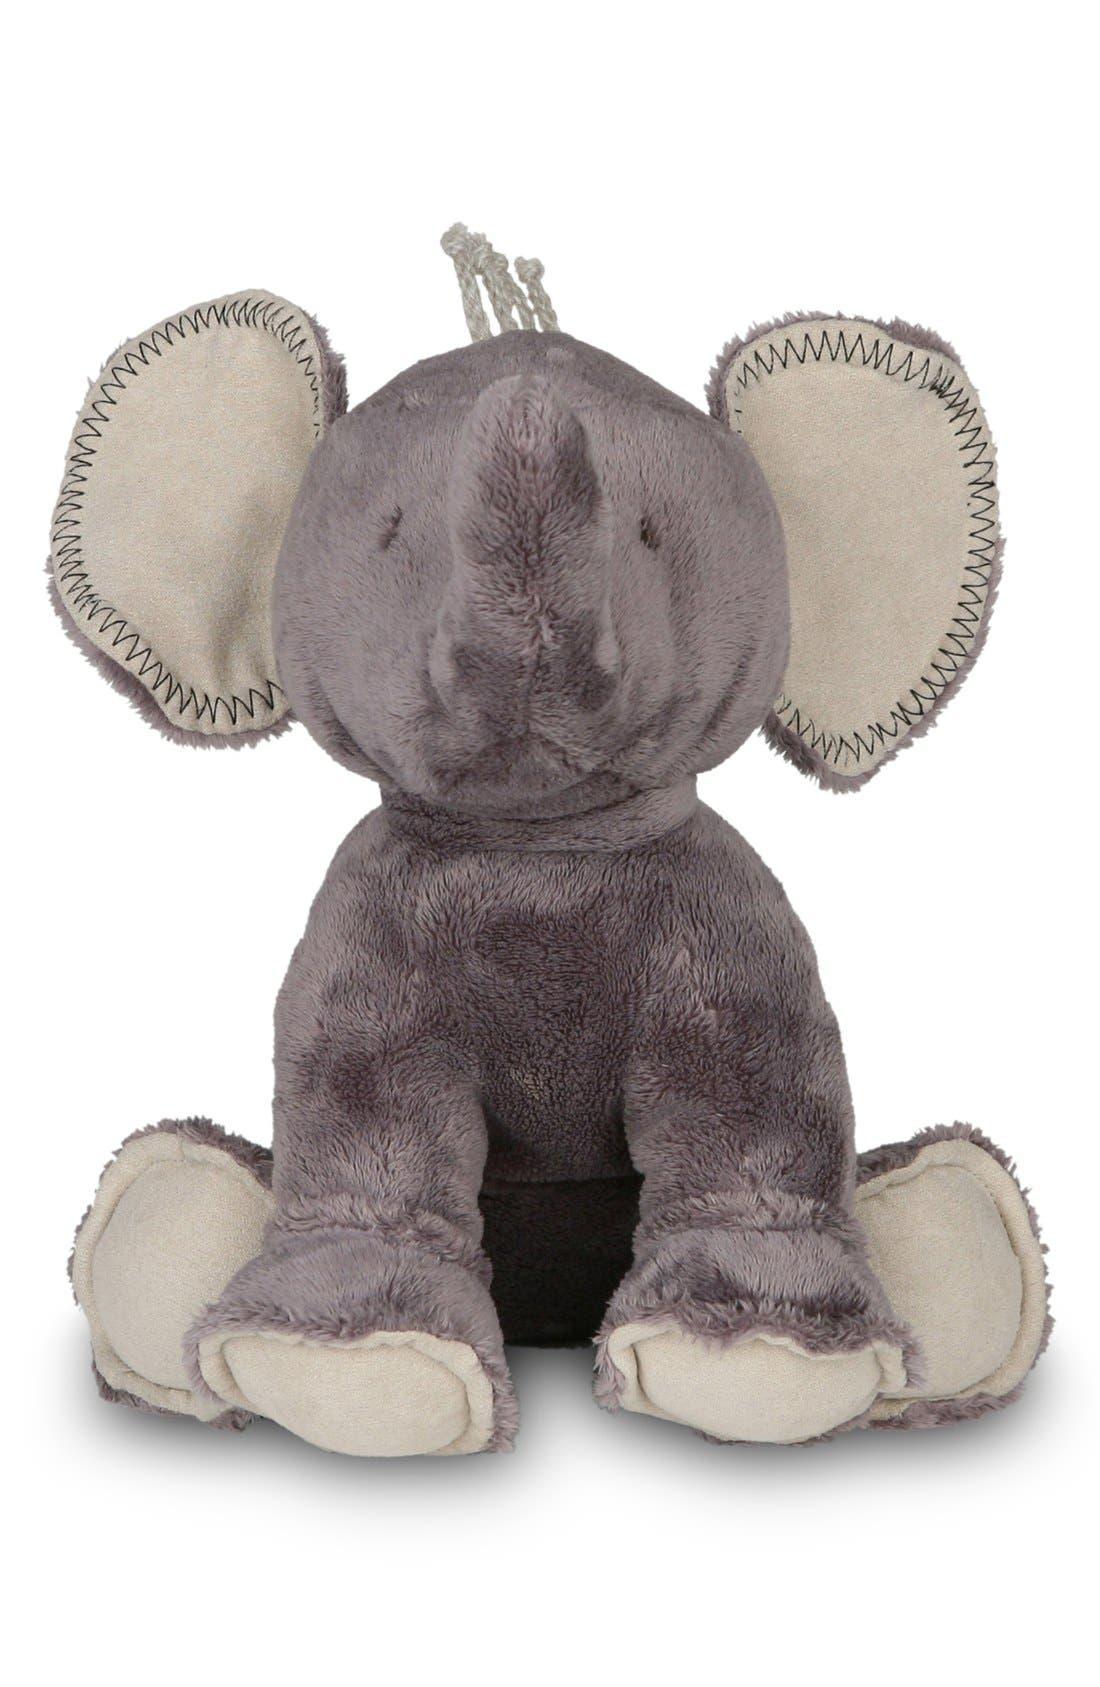 'Buddy the Elephant' Stuffed Animal,                             Main thumbnail 1, color,                             Warm Gray